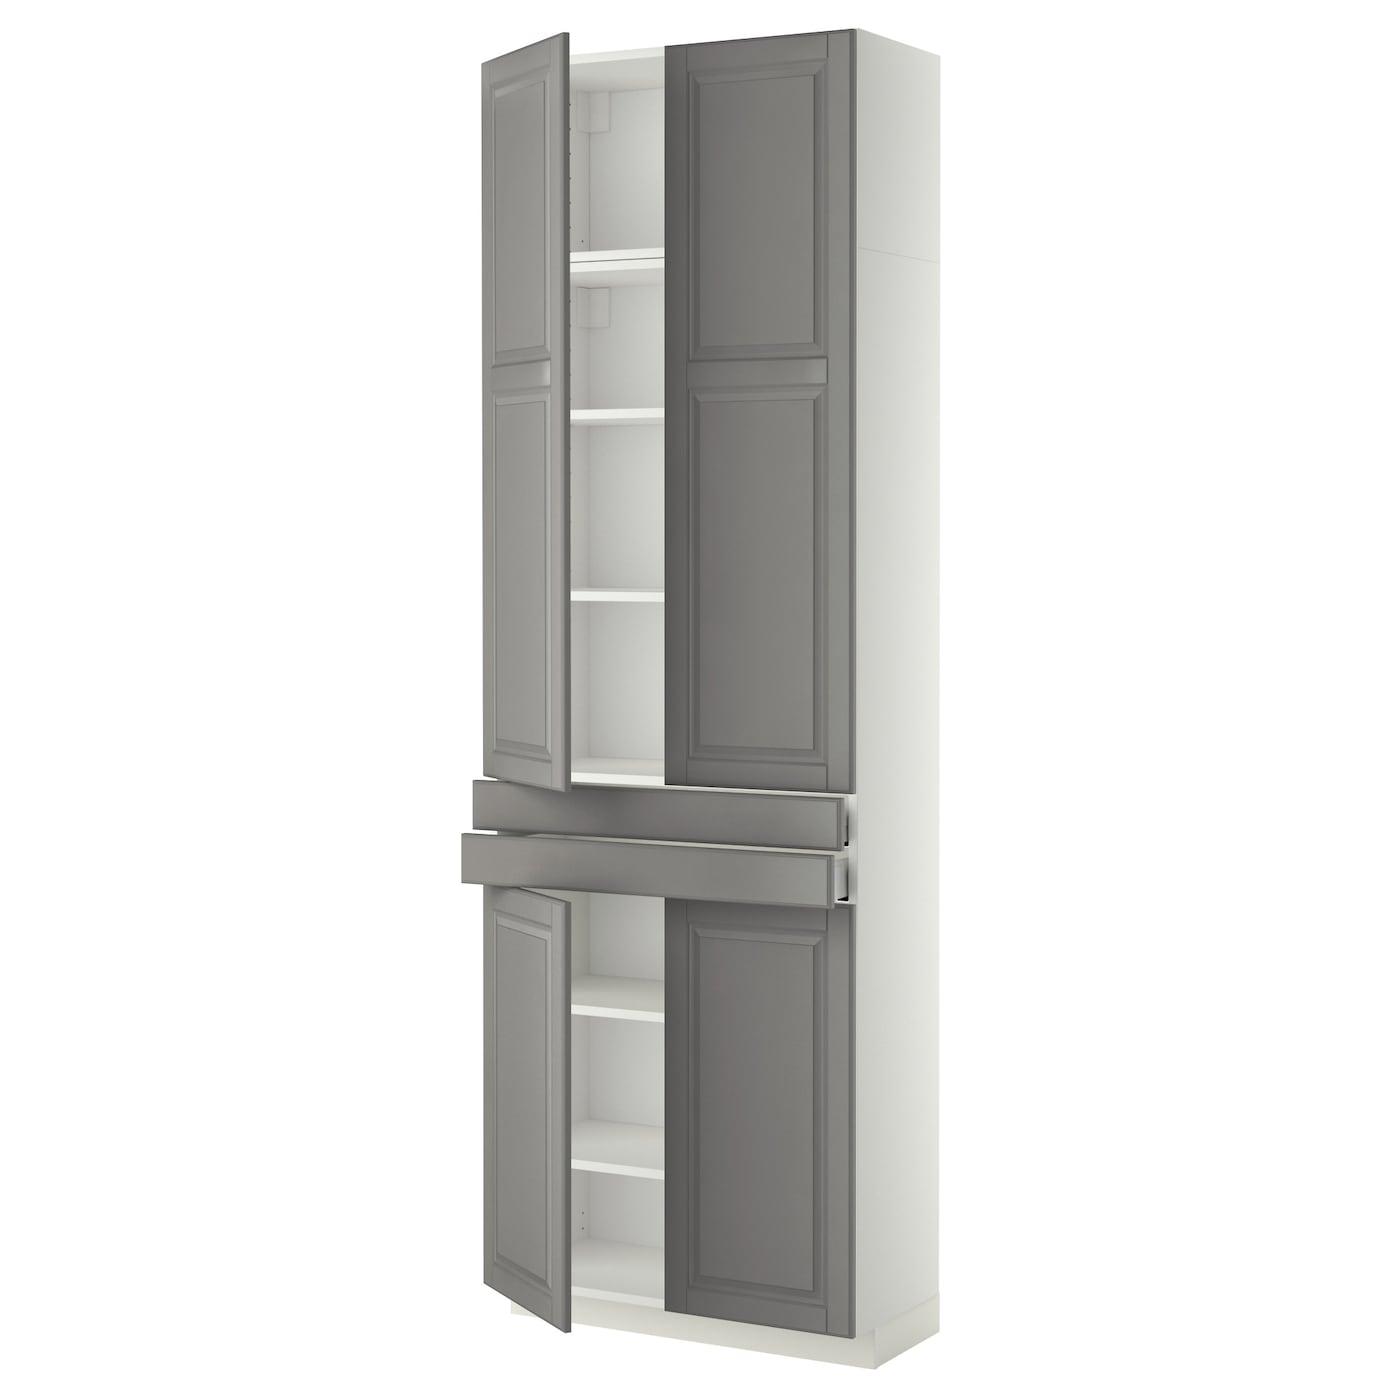 Ikea Metod Maximera Hi Cab W Shlvs 2 Drawers 4 Doors Sy Frame